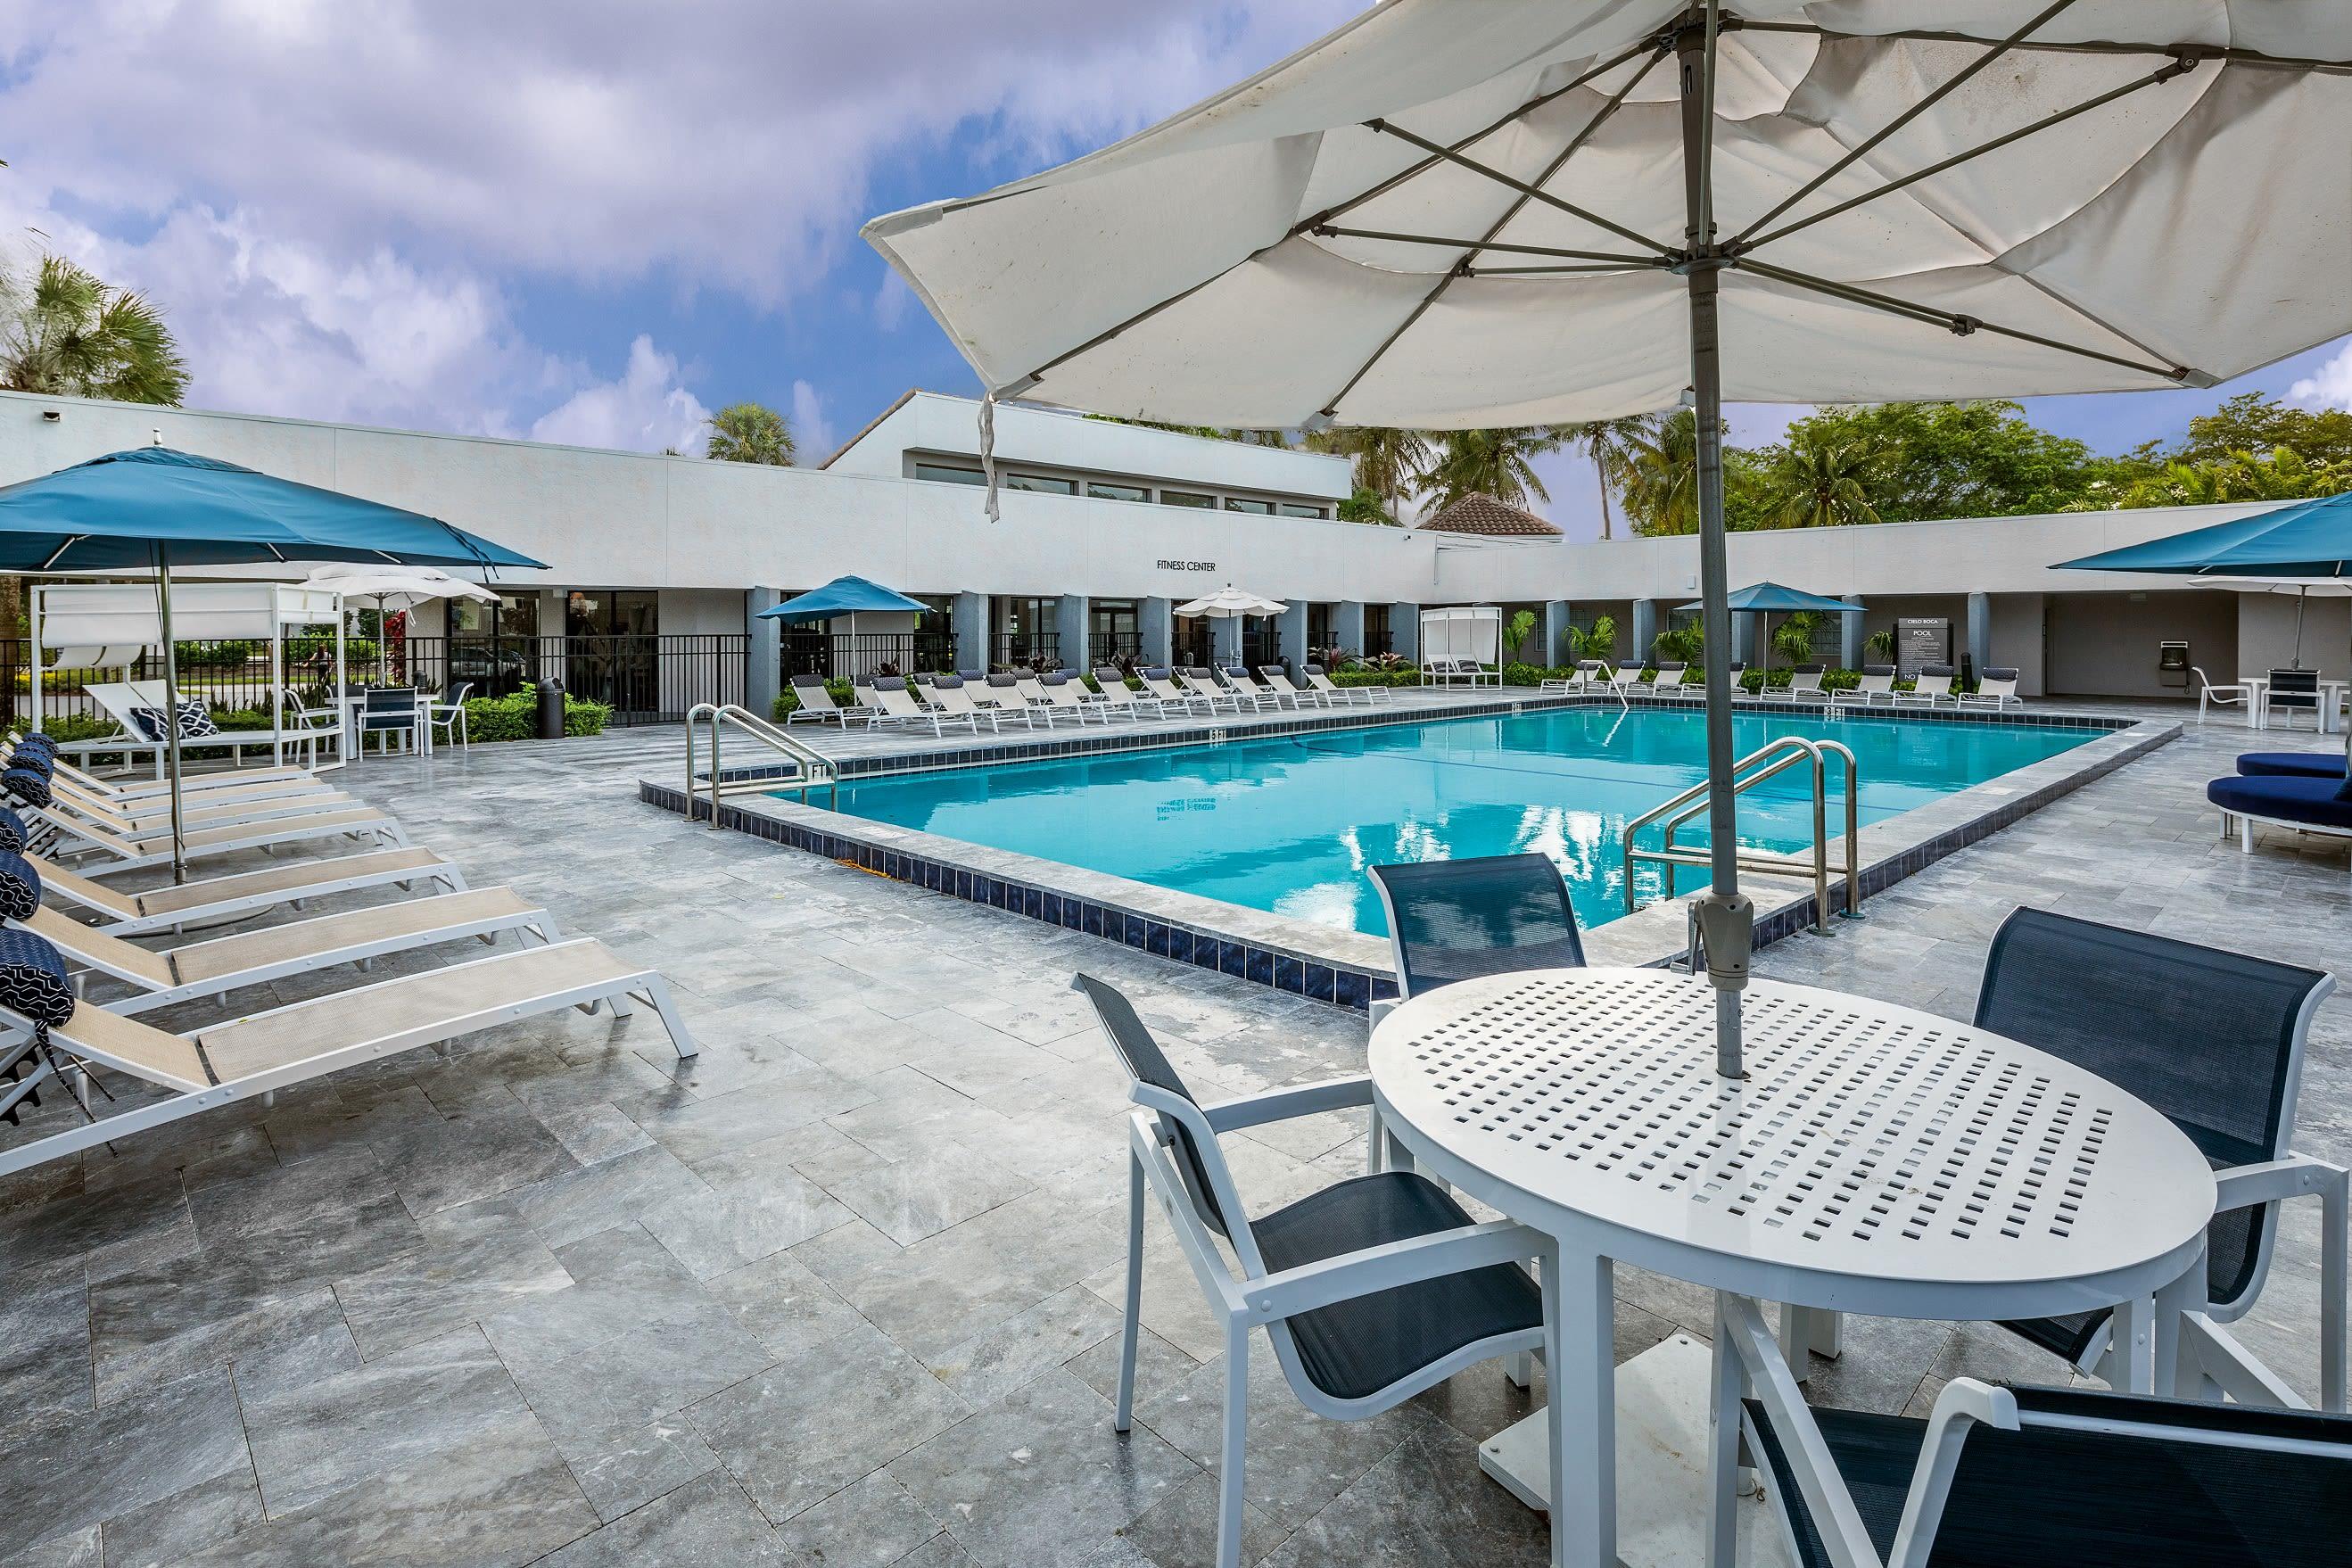 Poolside tables with umbrellas at Cielo Boca in Boca Raton, Florida